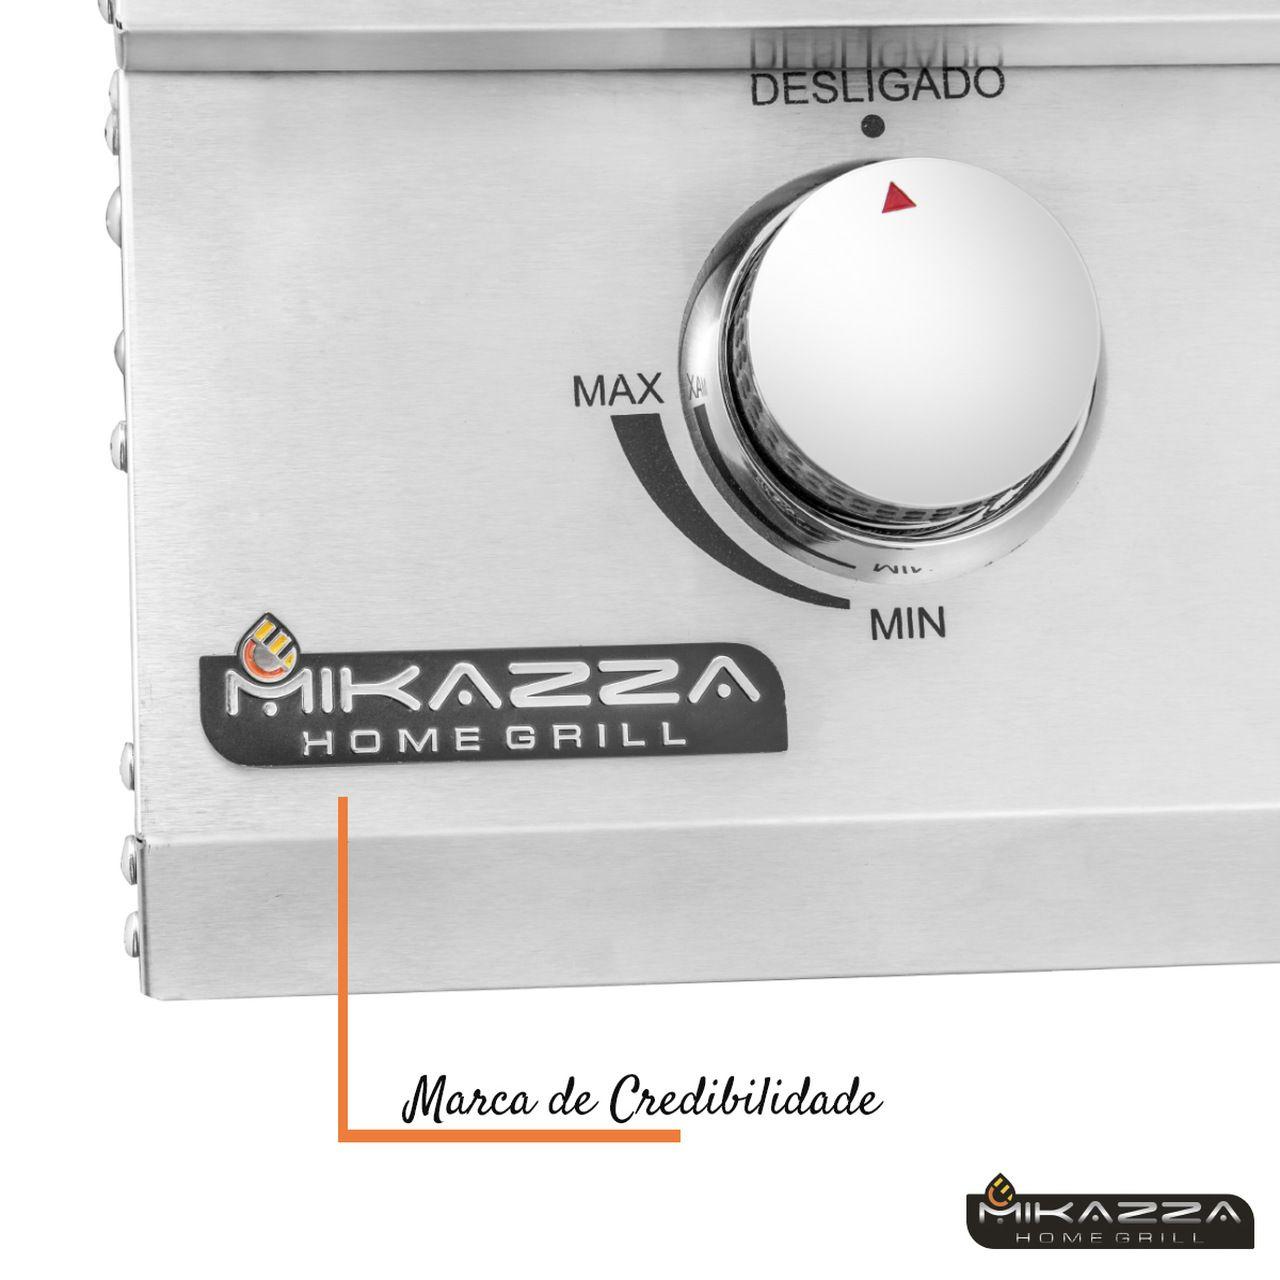 Churrasqueira à Gás Embutir Mikazza Pro 5  Combo + Chapa de Ferro Fundido + Capa Protetora